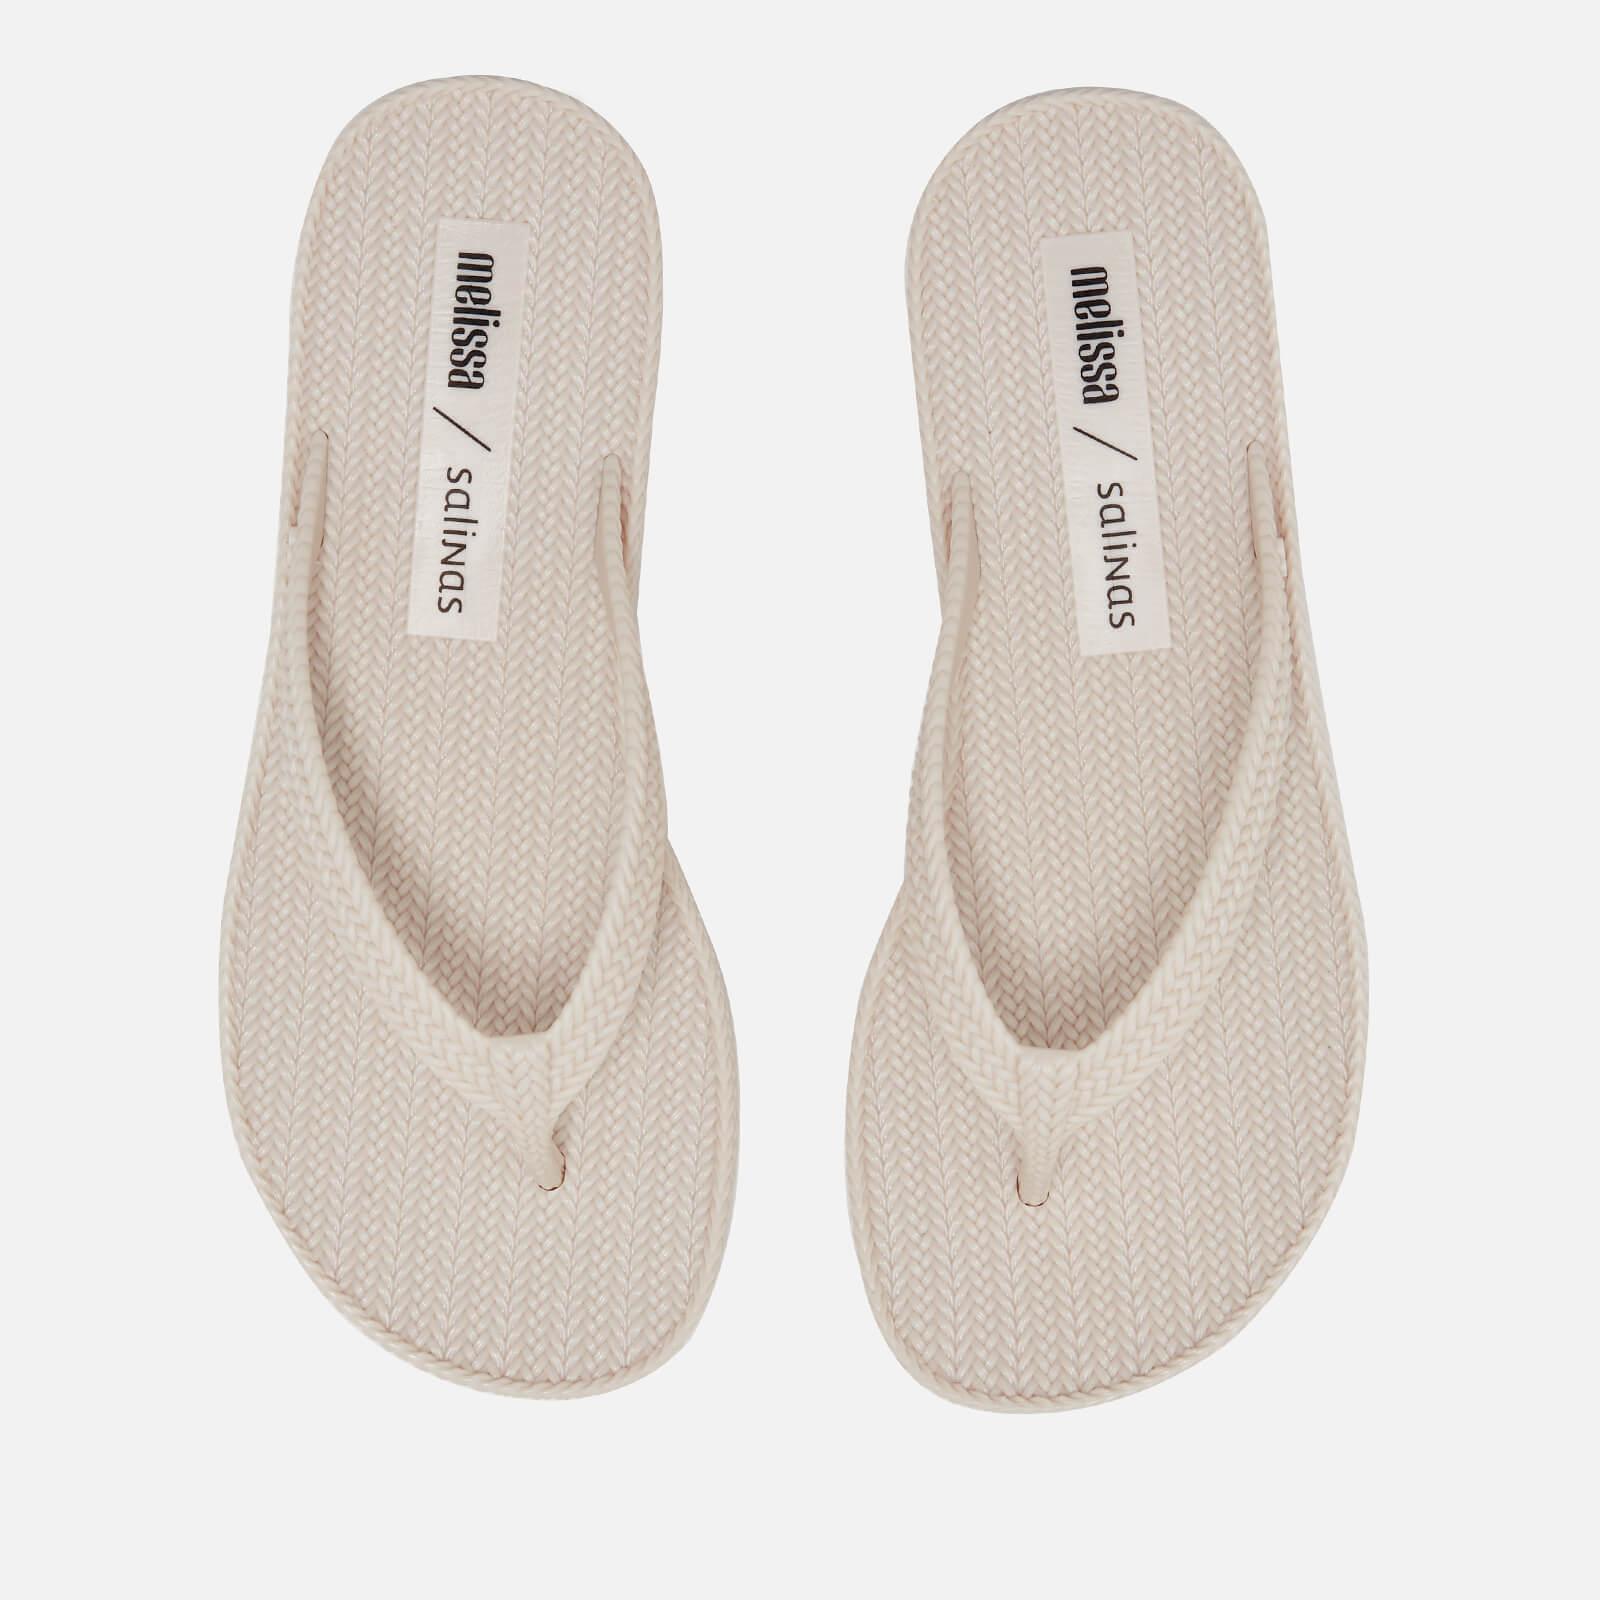 Melissa Women's Salinas Summer Braid Flip Flops - Ivory - UK 8 - White